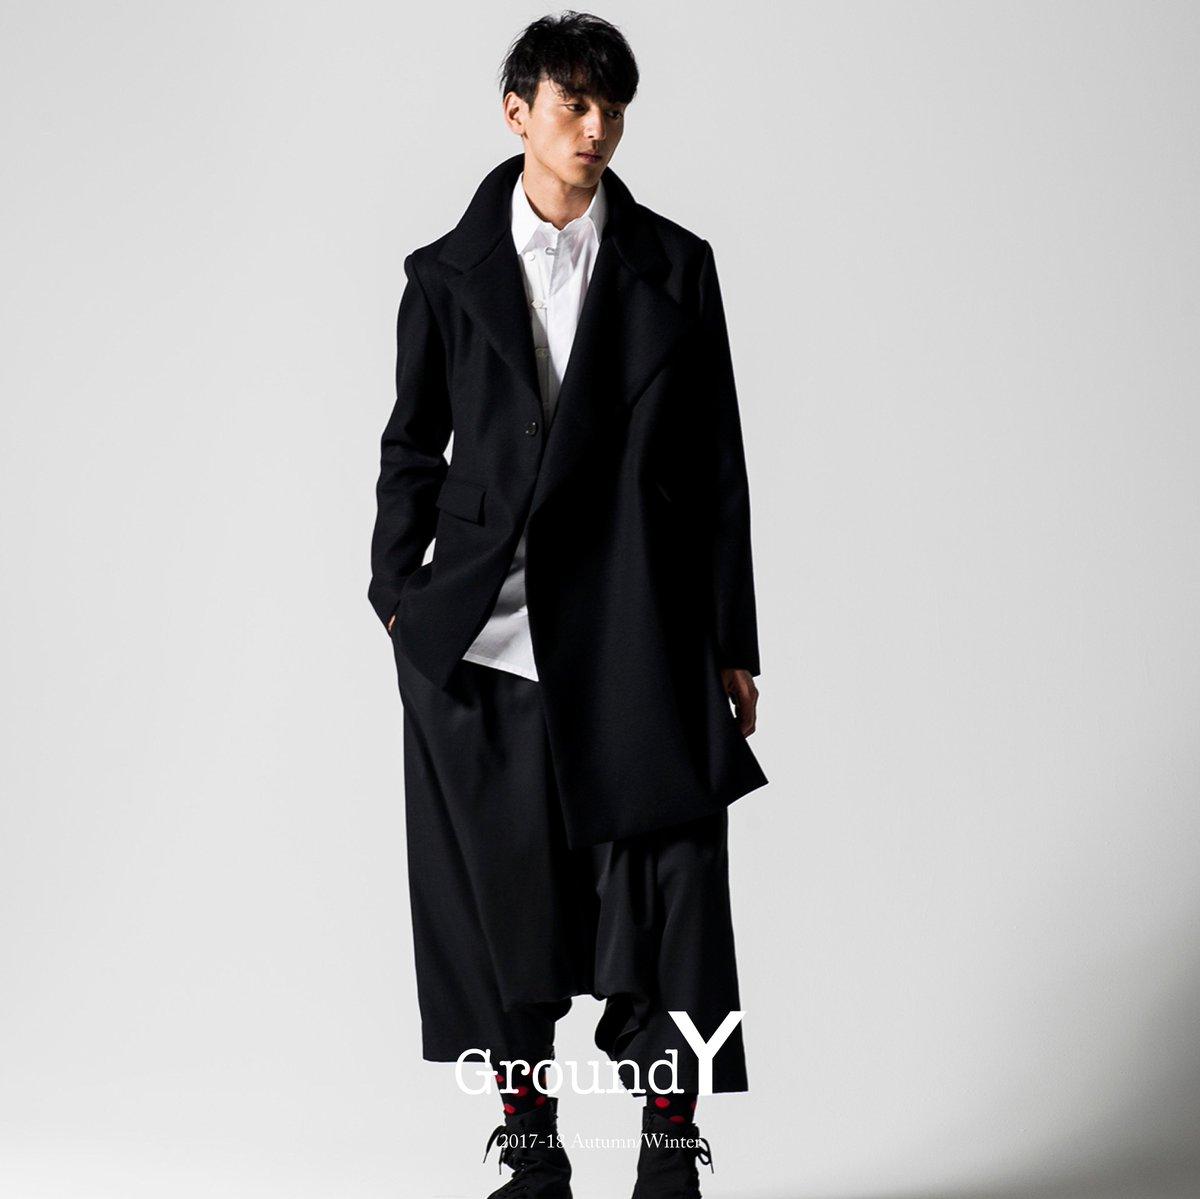 2017-18 Autumn/Winter □Ground Y EC store http://syte.yohjiyamamoto.co.jp/item?brand_id=5/ … □Ground Y members entry ...